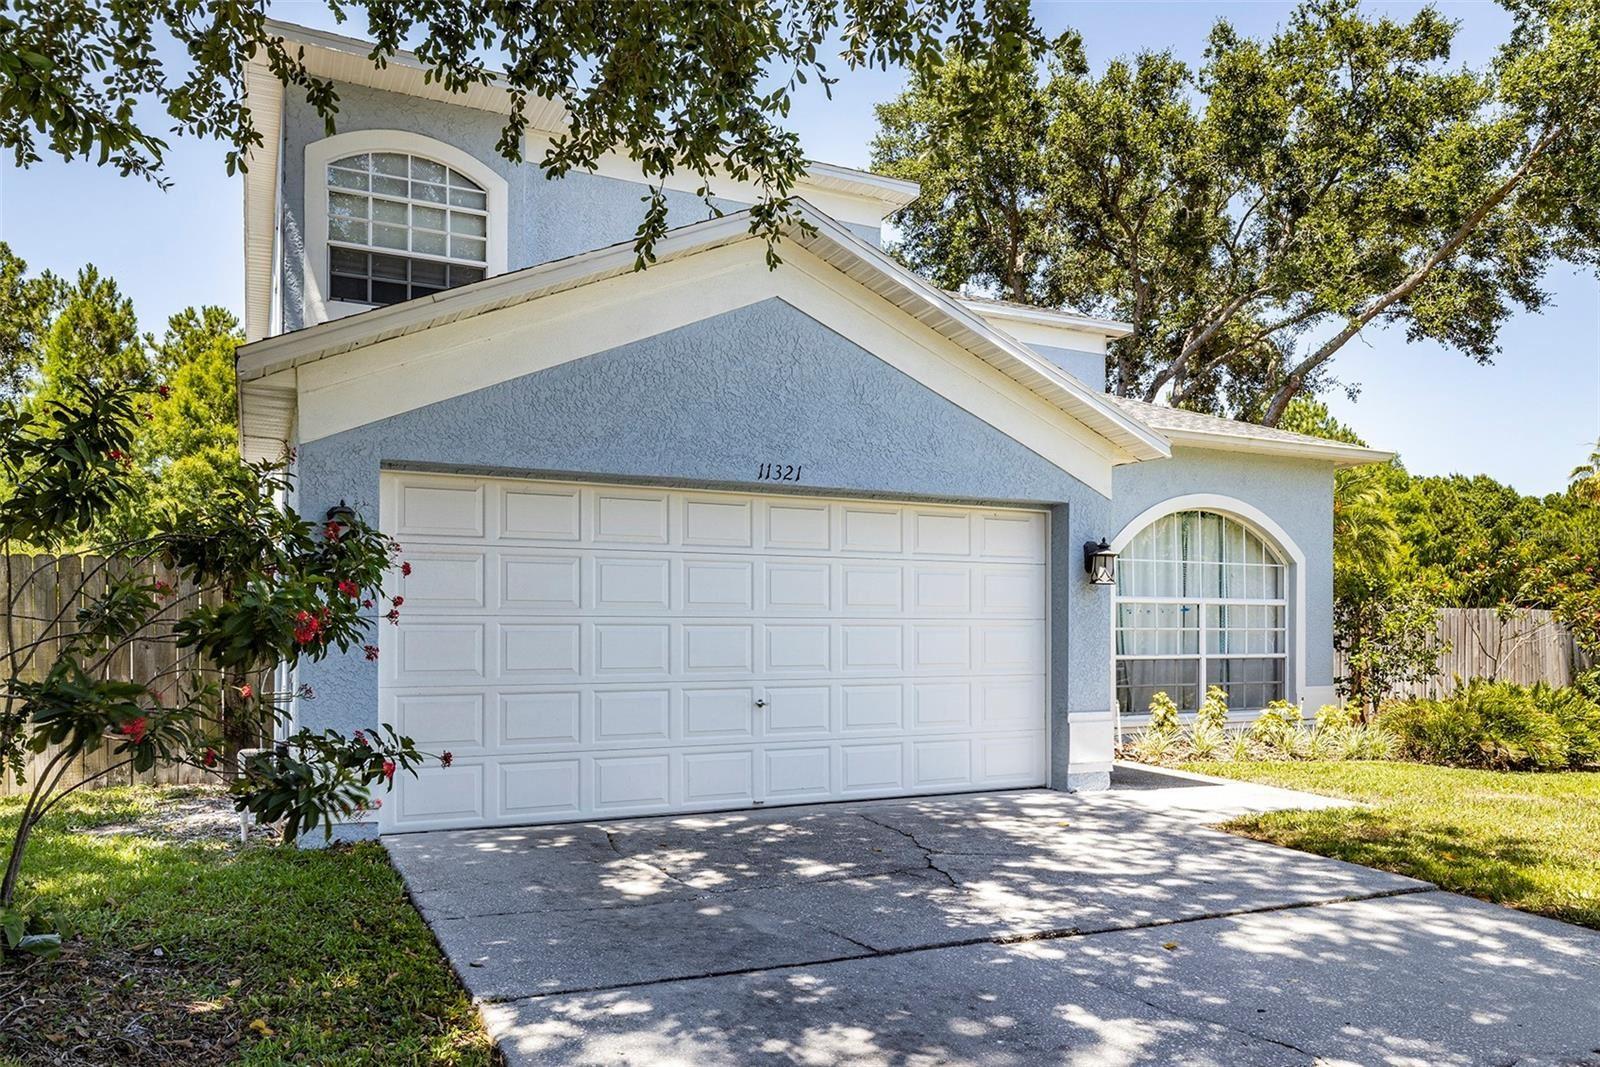 11321 GEORGETOWN CIRCLE, Tampa, FL 33635 - MLS#: U8124397